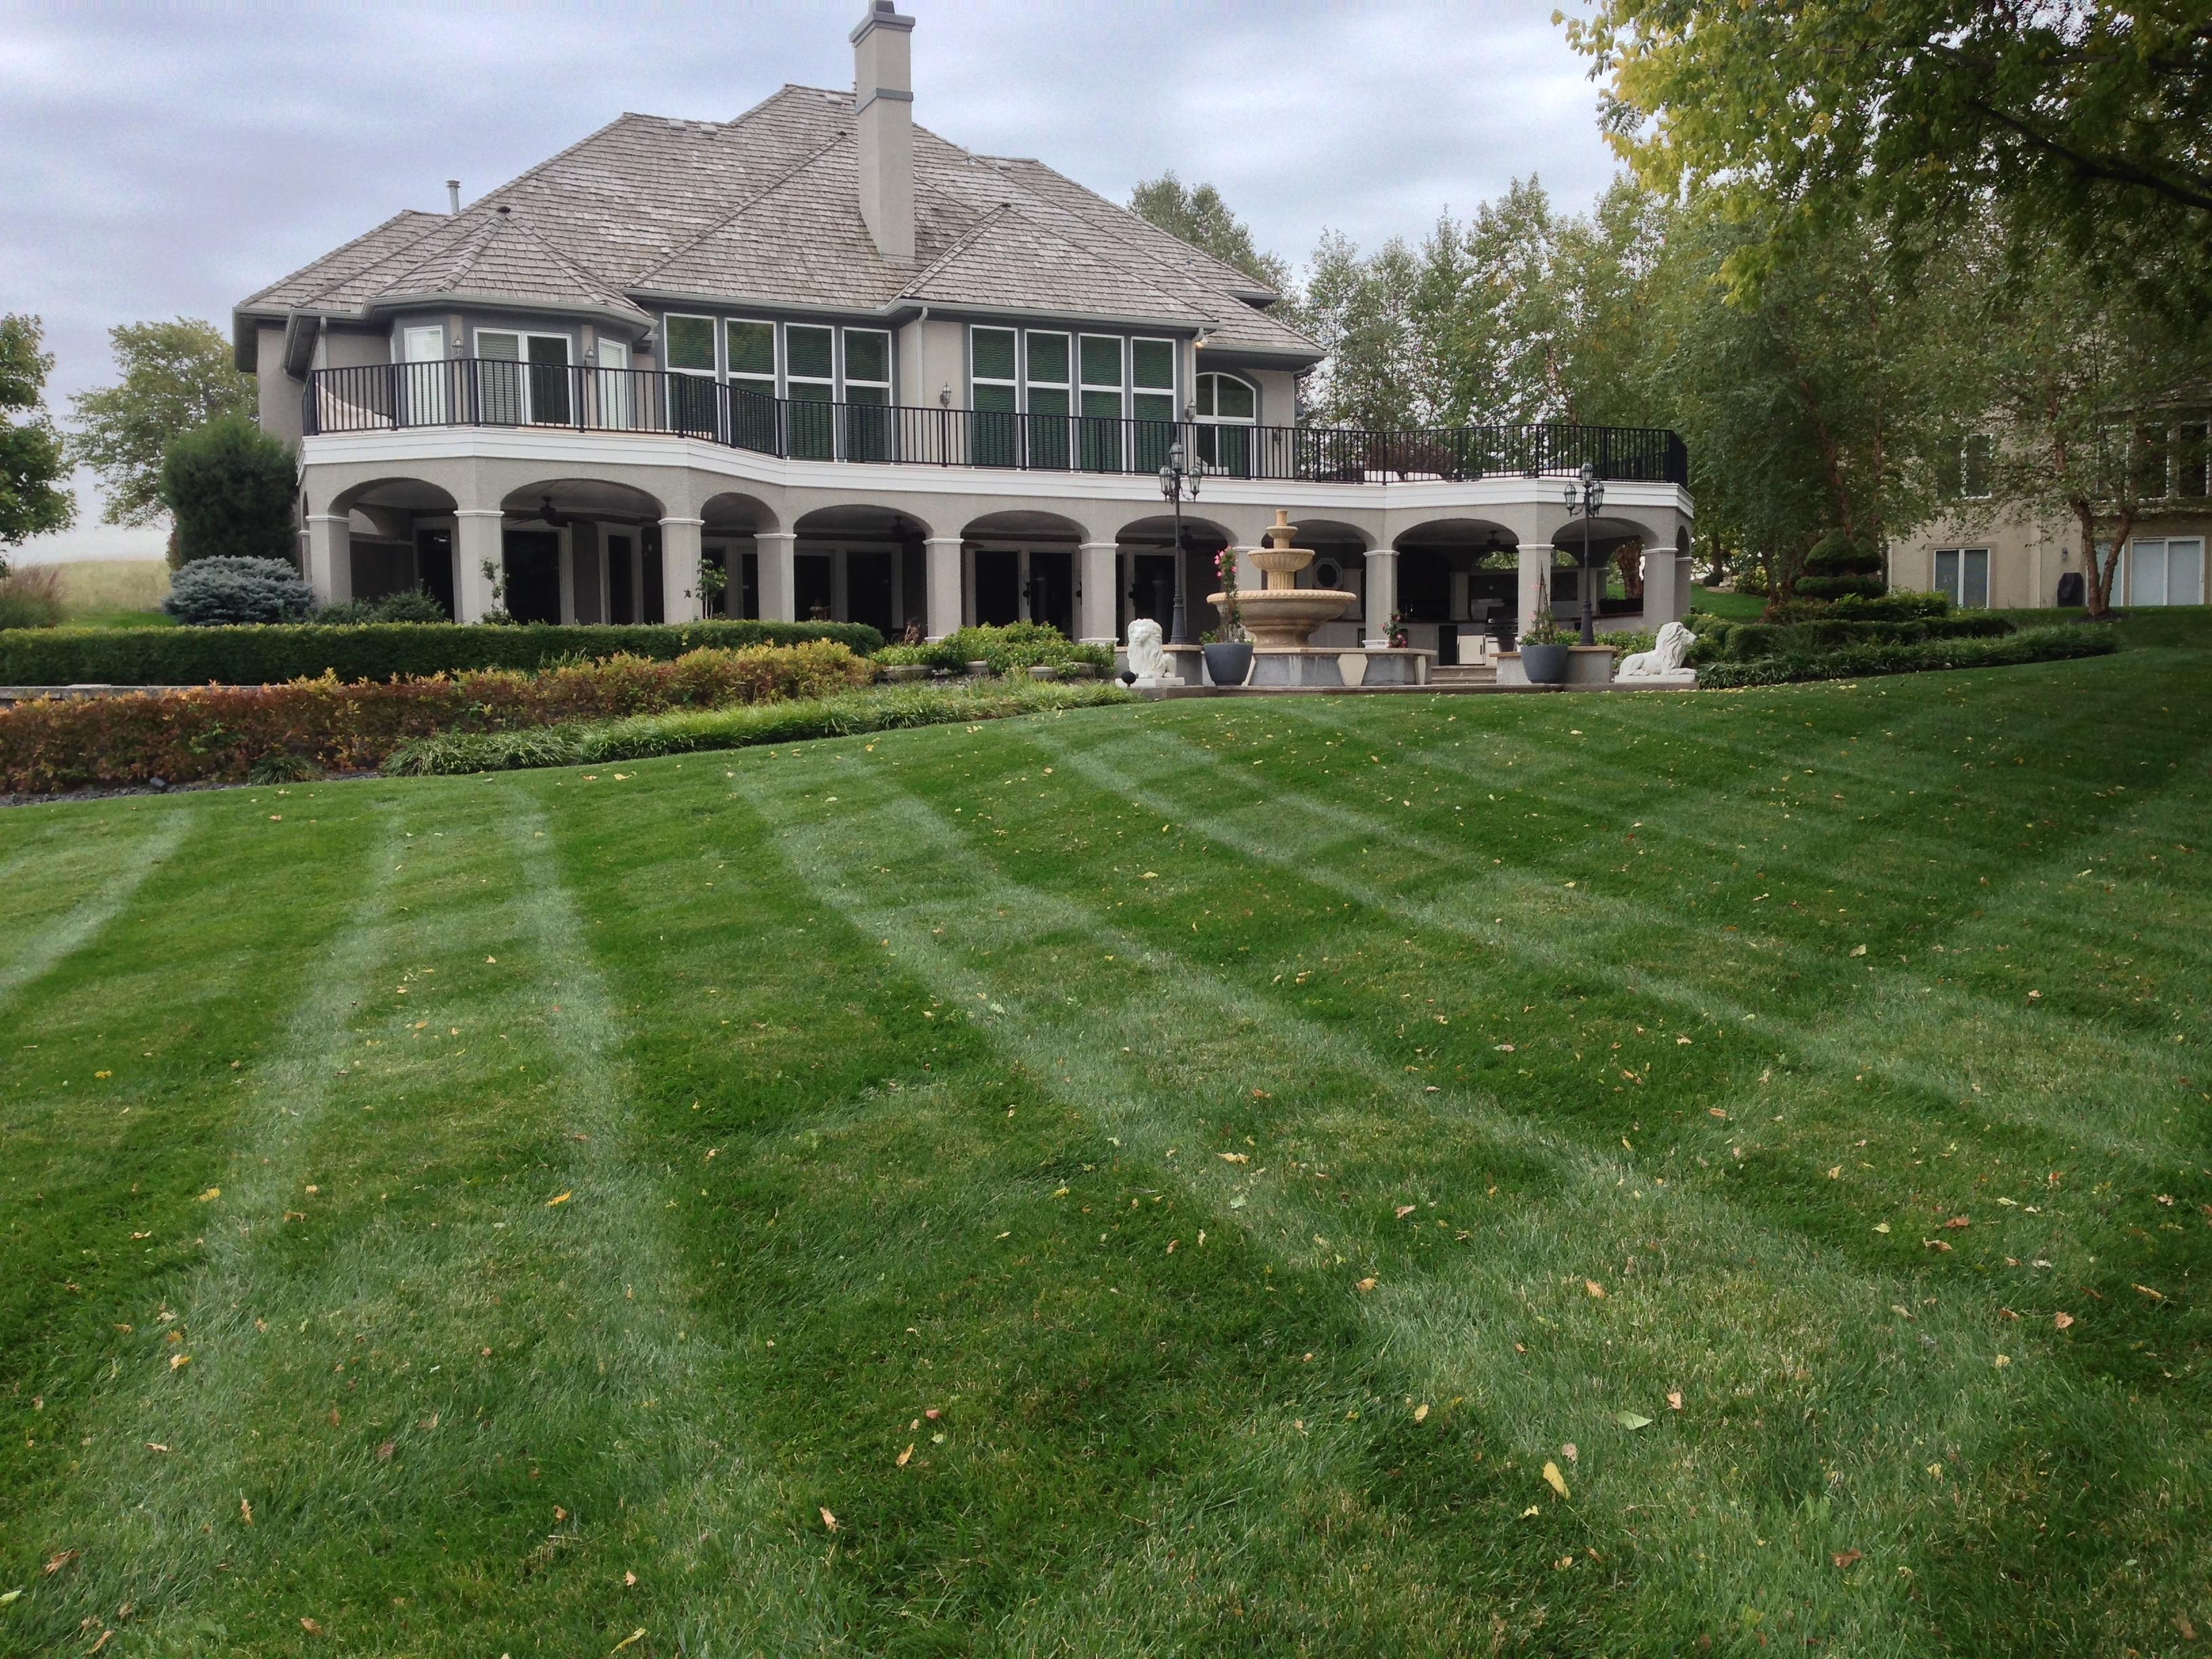 Bradford Street Lawn & Landscaping, LLC image 3